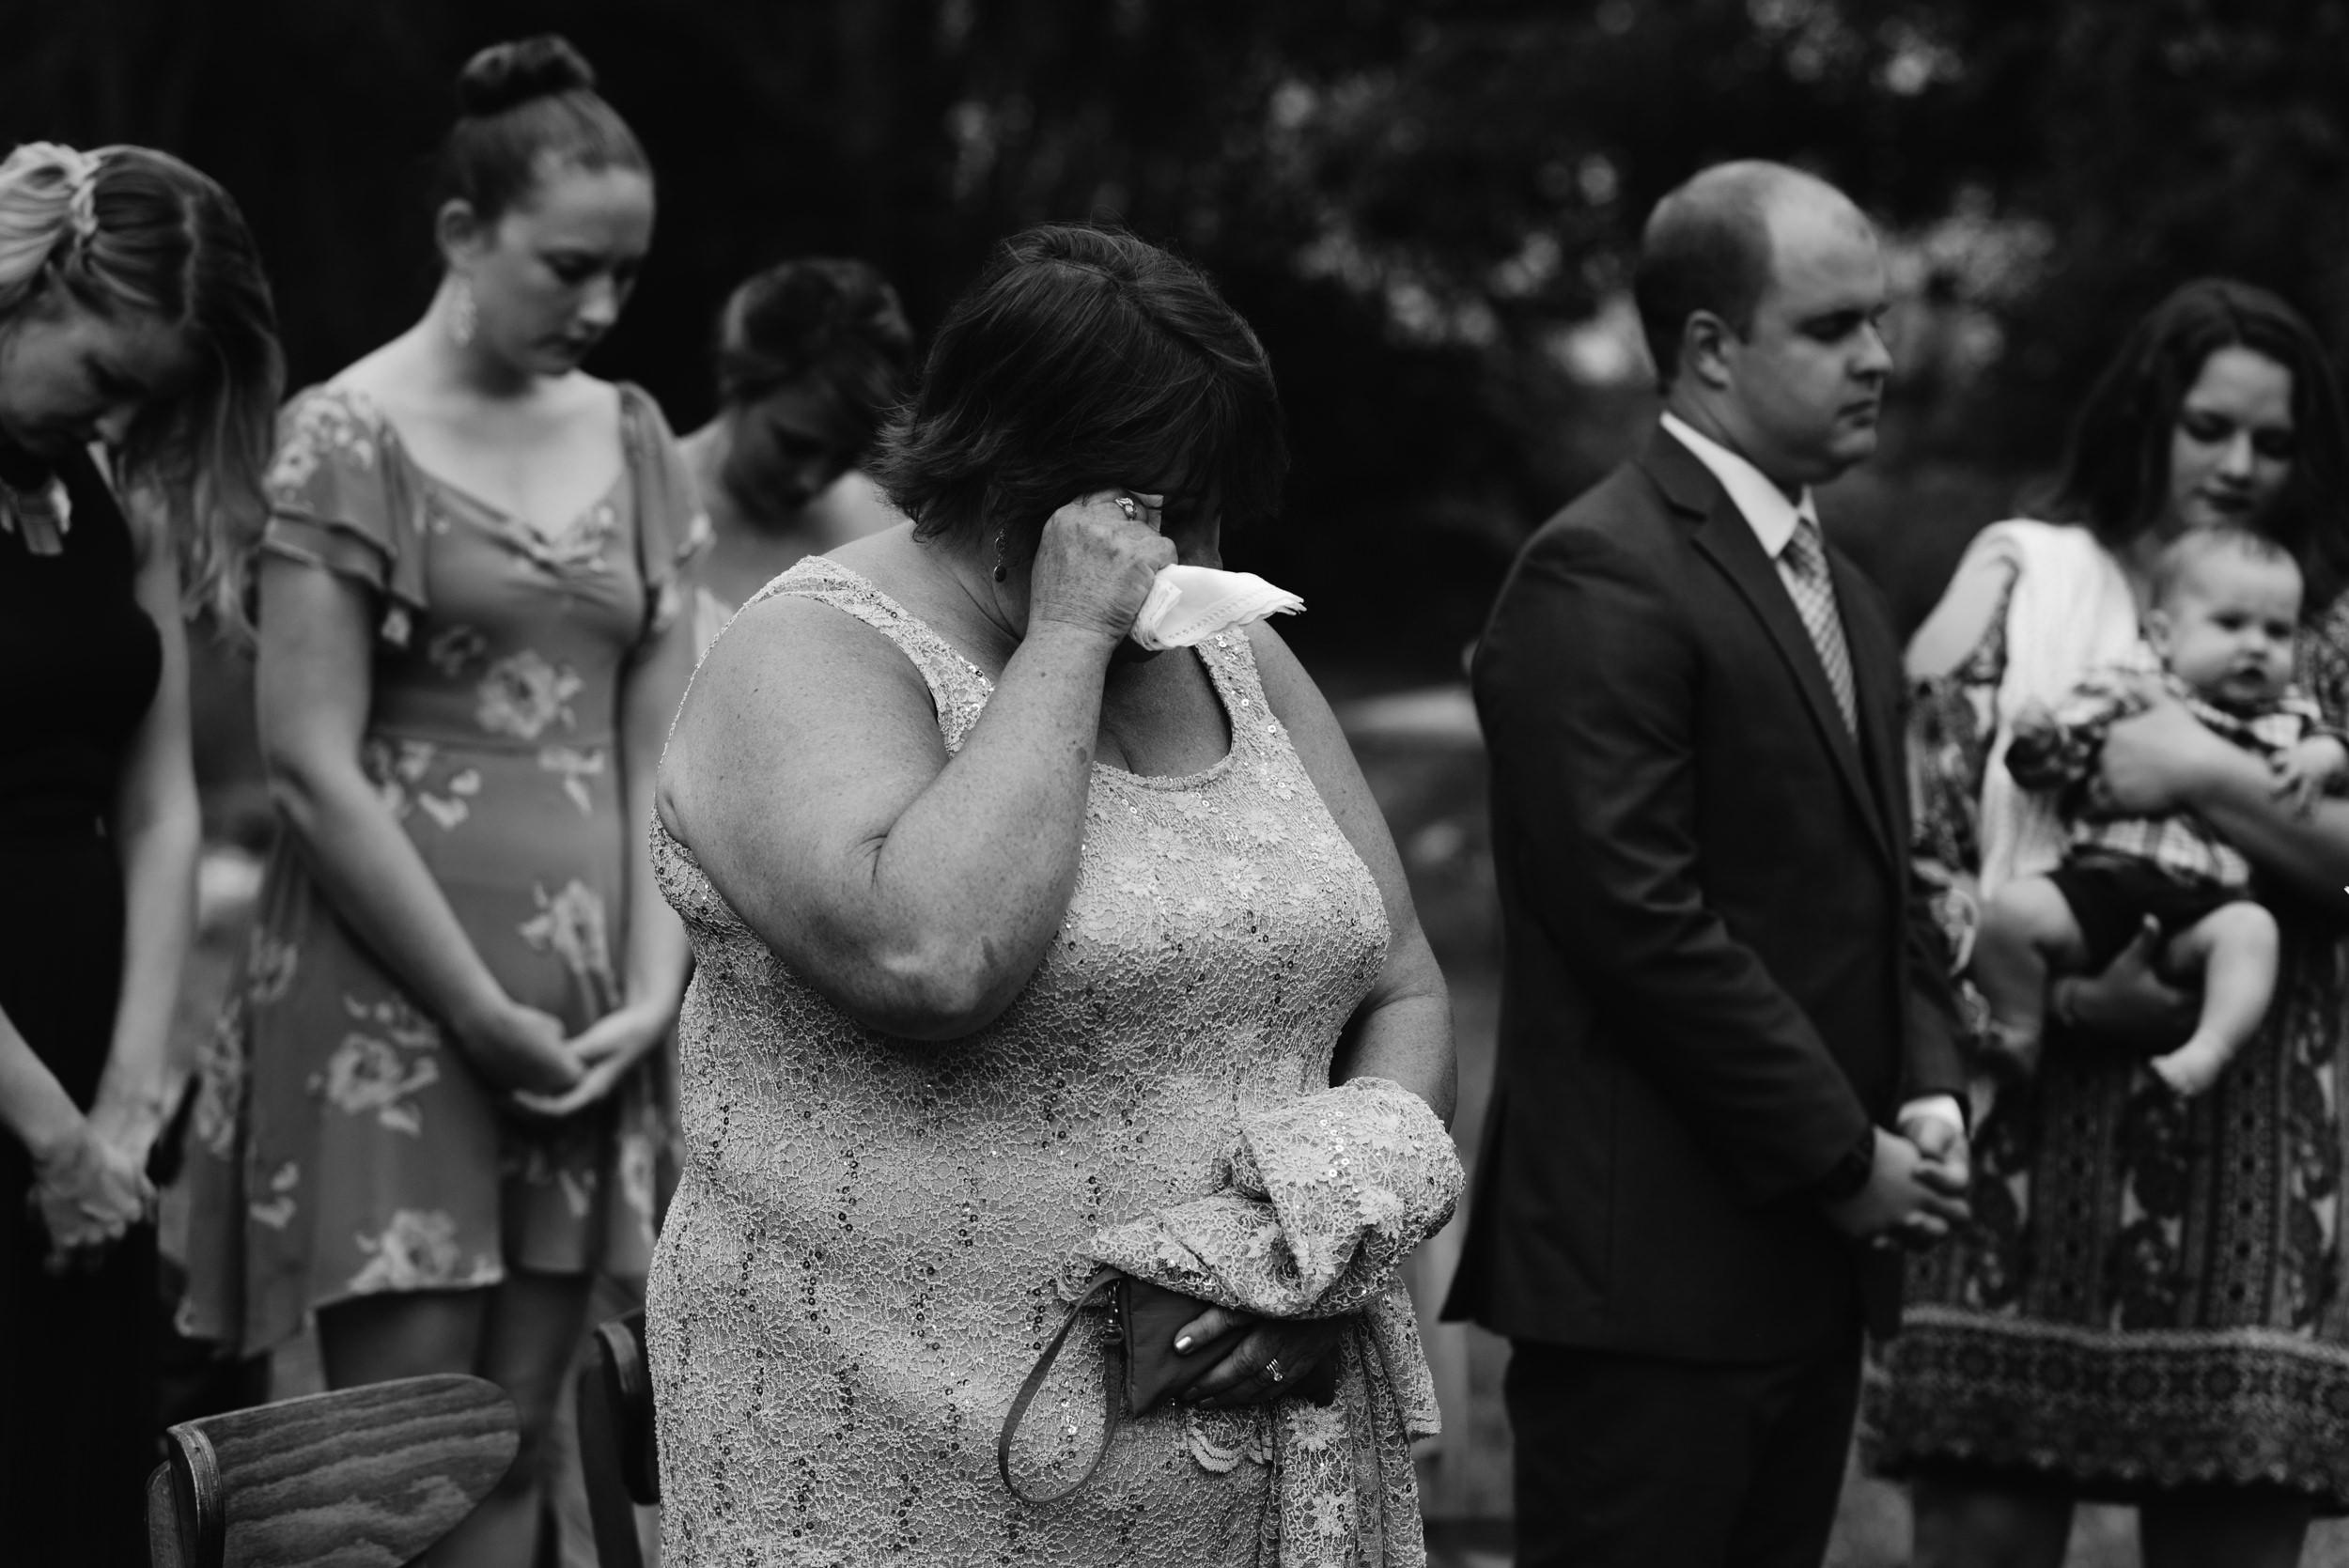 Wedding ceremony at Three Leaf Farm. Boulder elopement and wedding photographer.